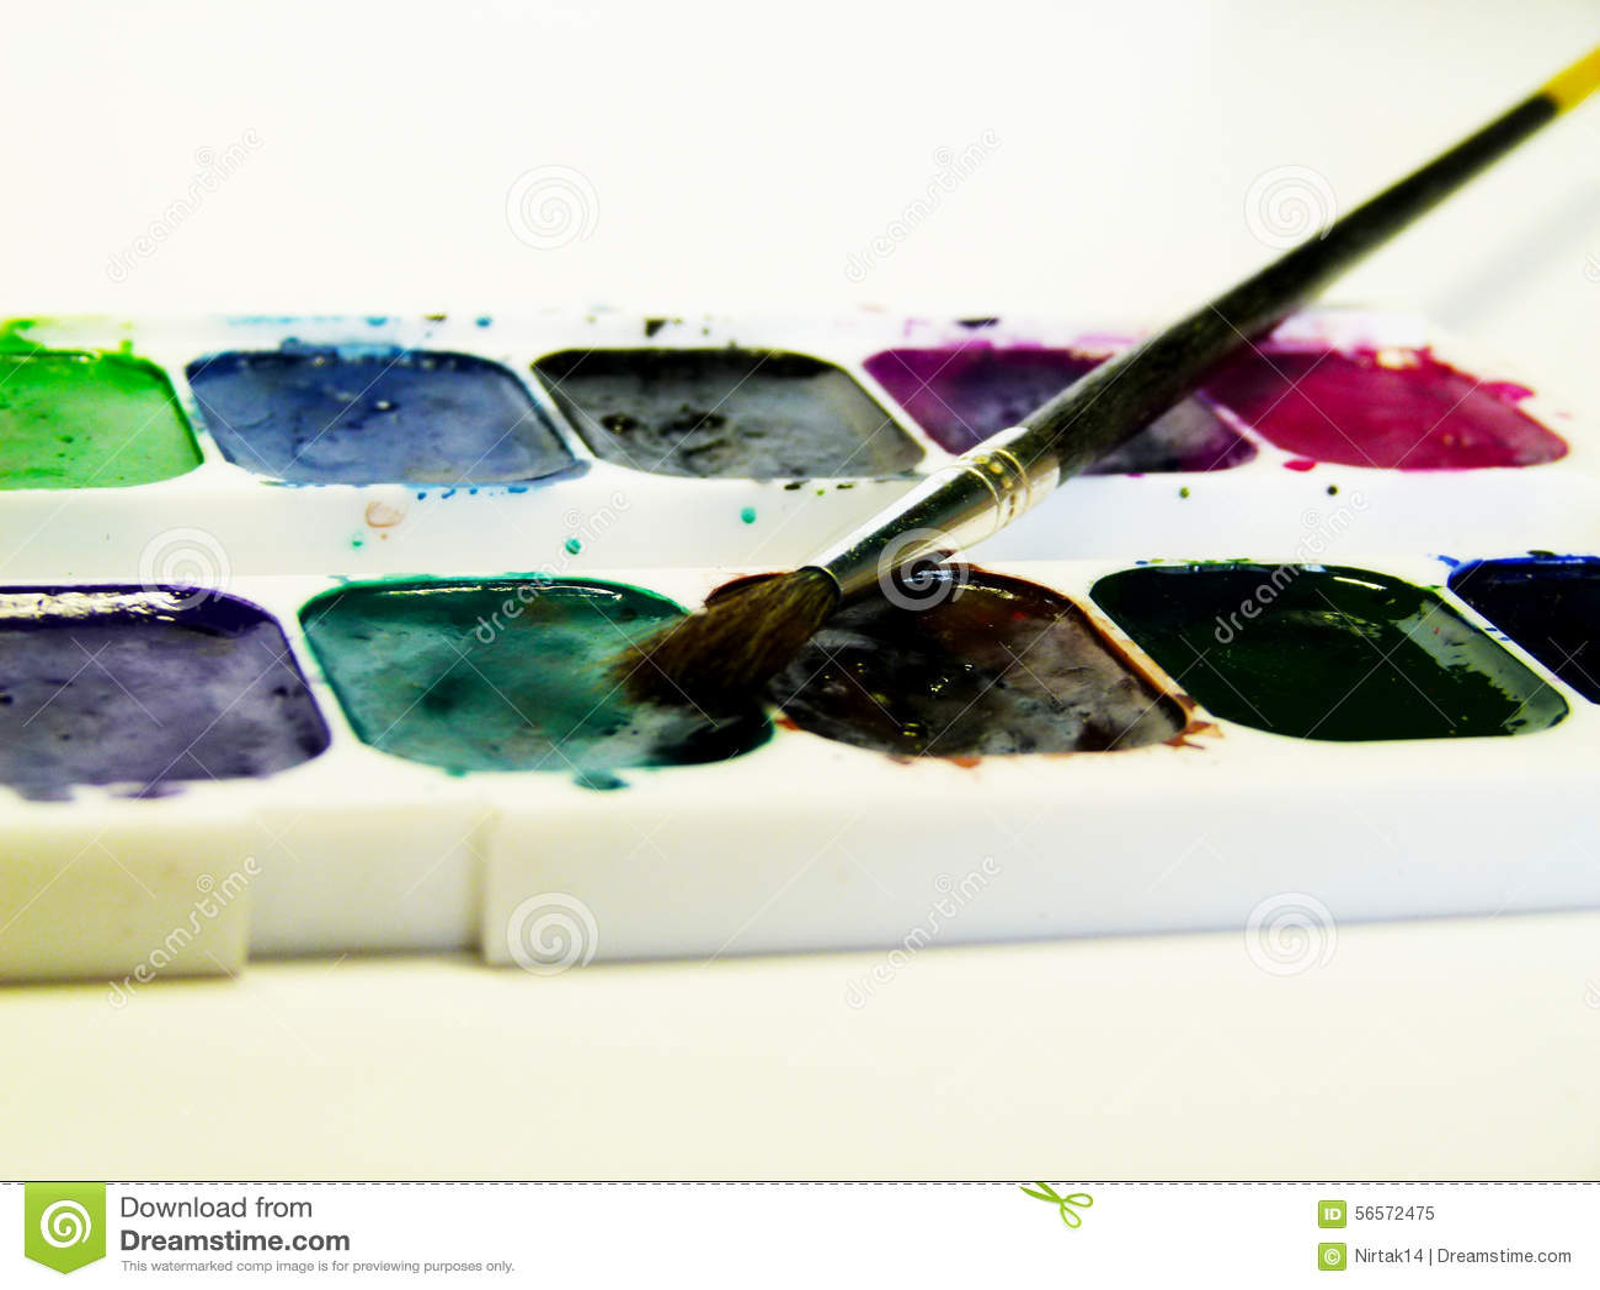 Download χρώμα βουρτσών στοκ εικόνα. εικόνα από φρεσκάδα, ελεύθερος - 56572475